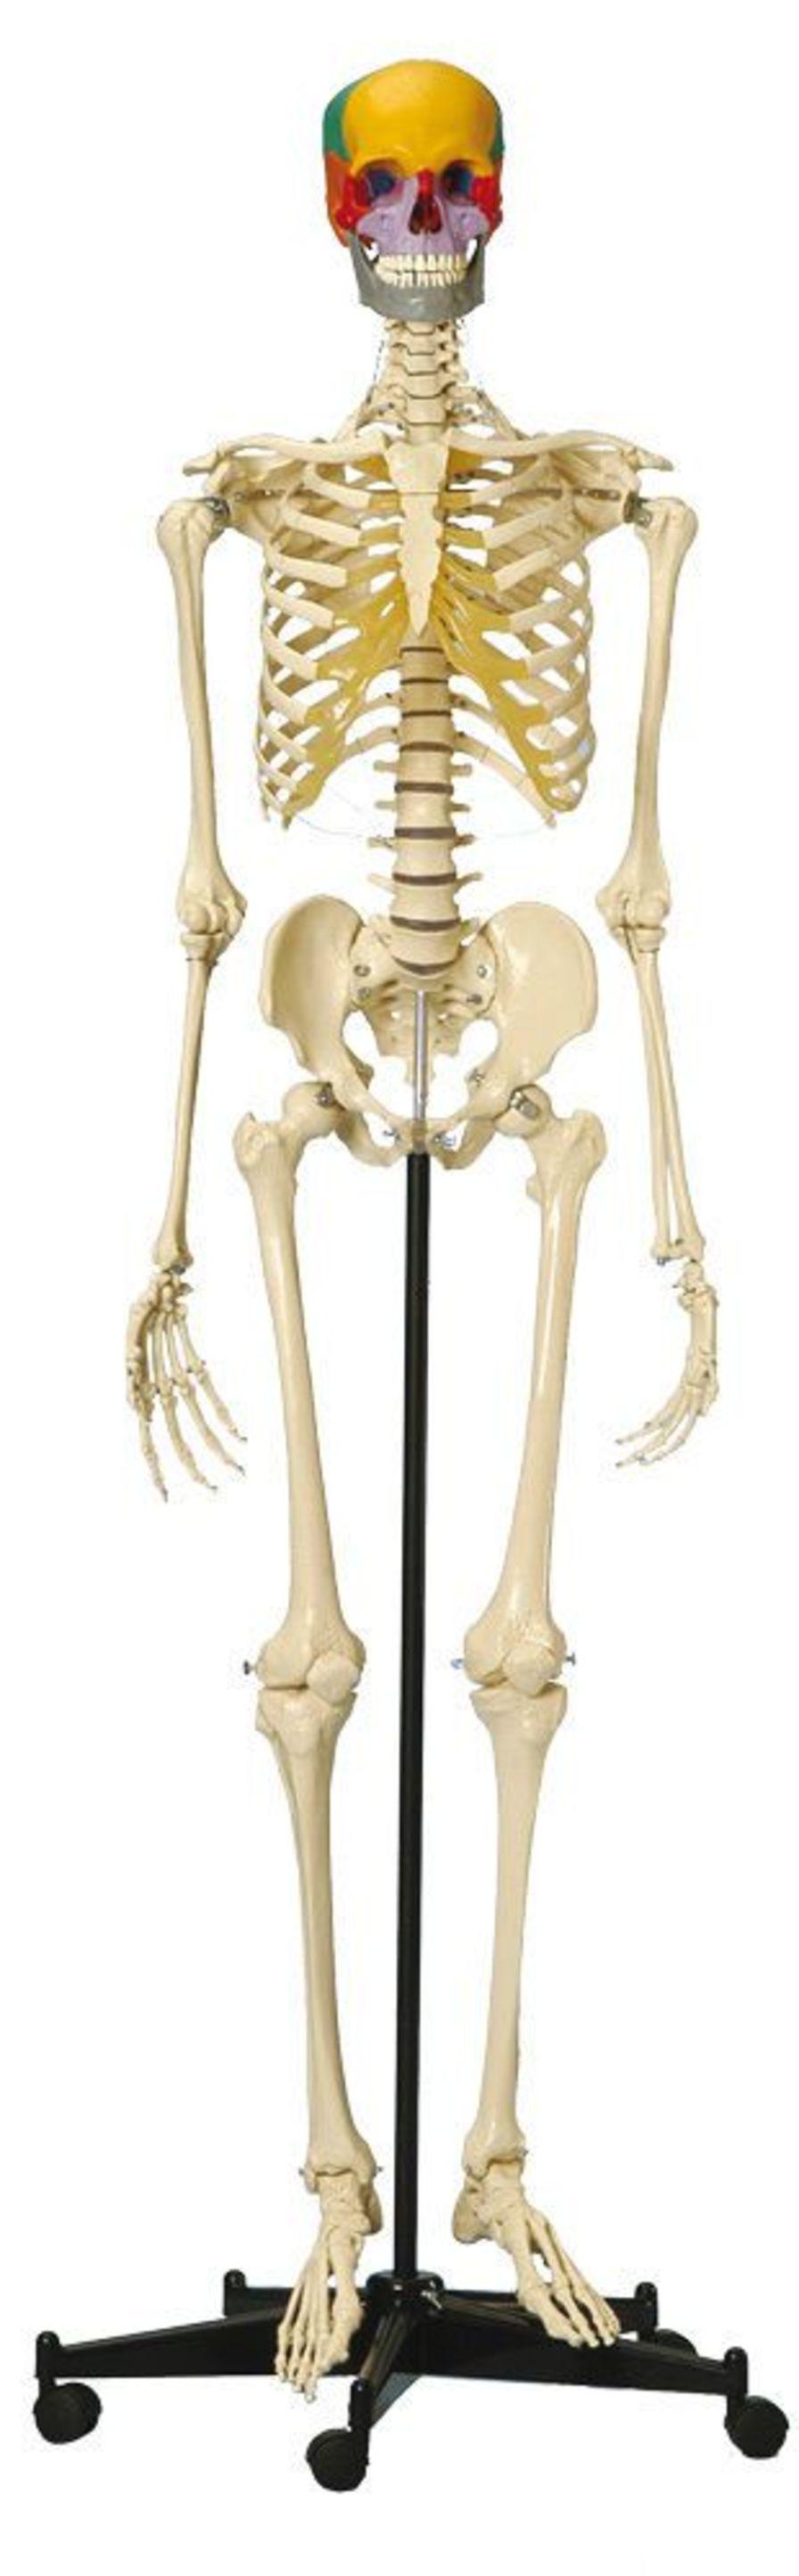 Skeleton anatomical model / articulated A200.5 RÜDIGER - ANATOMIE